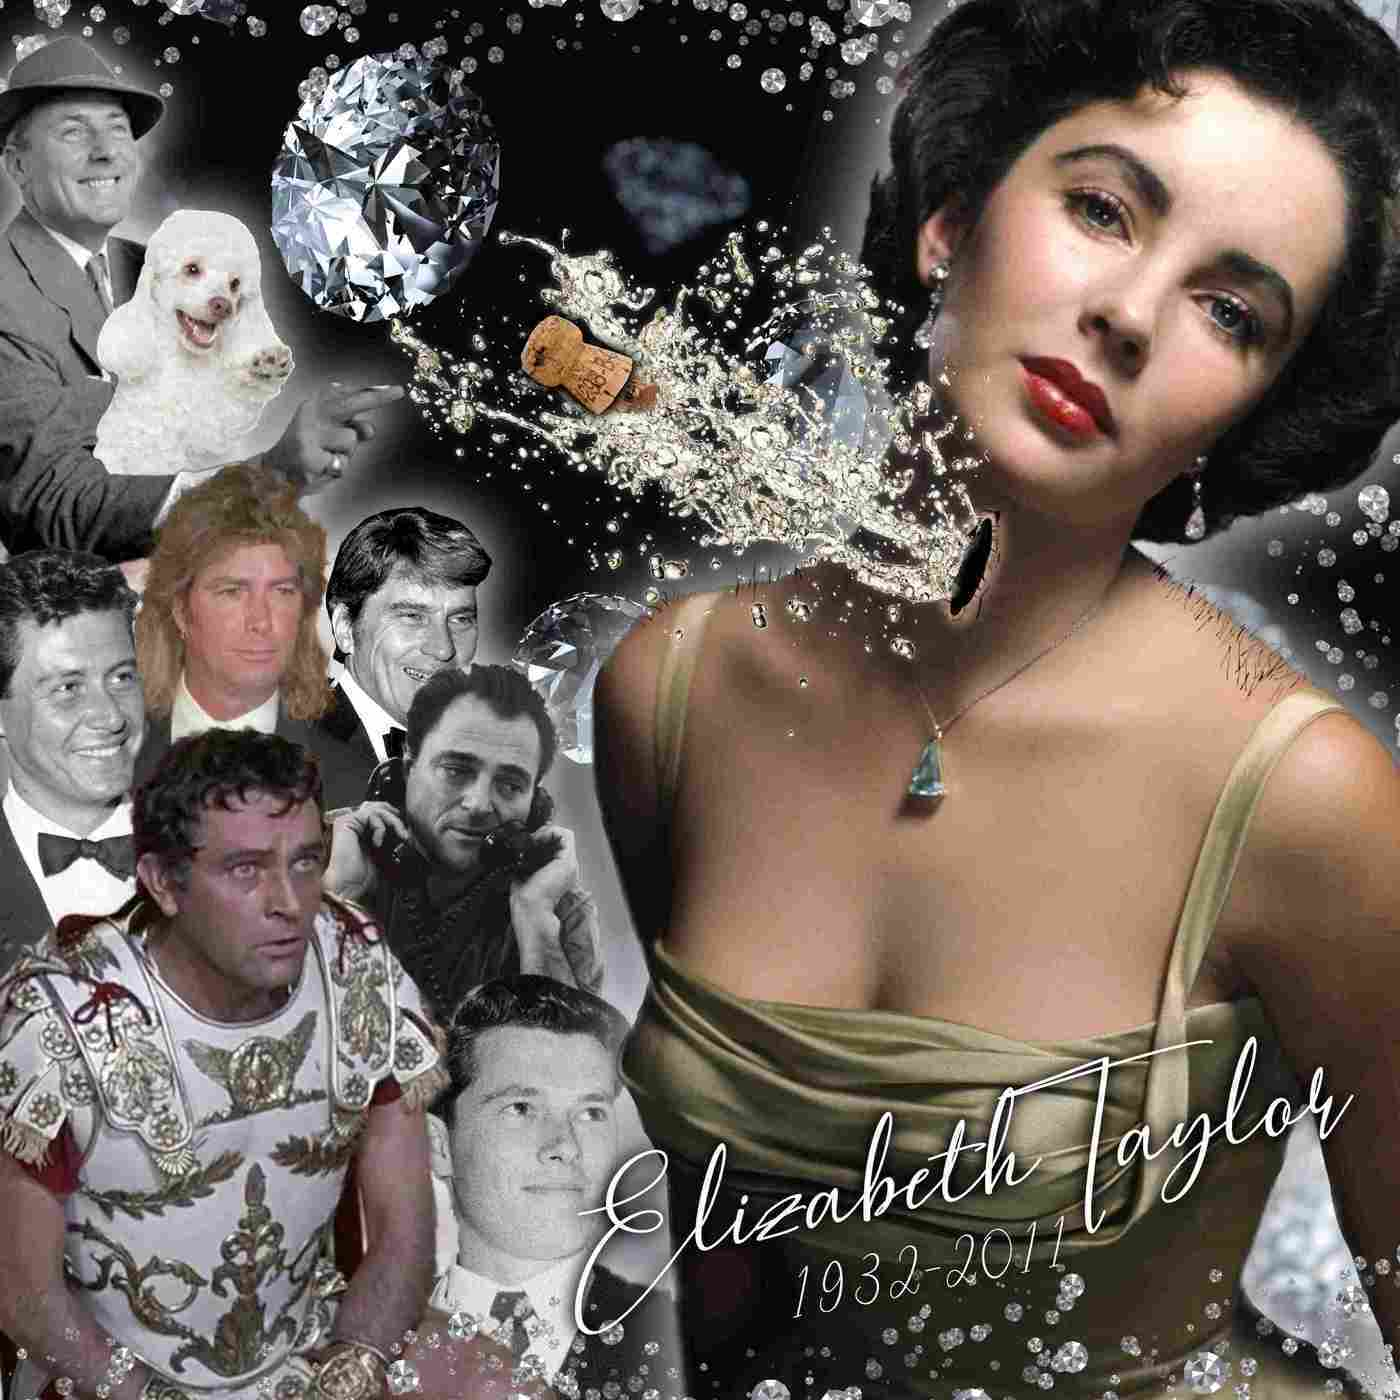 Roast Mortem Cast liztaylor: 133 - Elizabeth Taylor: Once a Child Star, Always a Child!